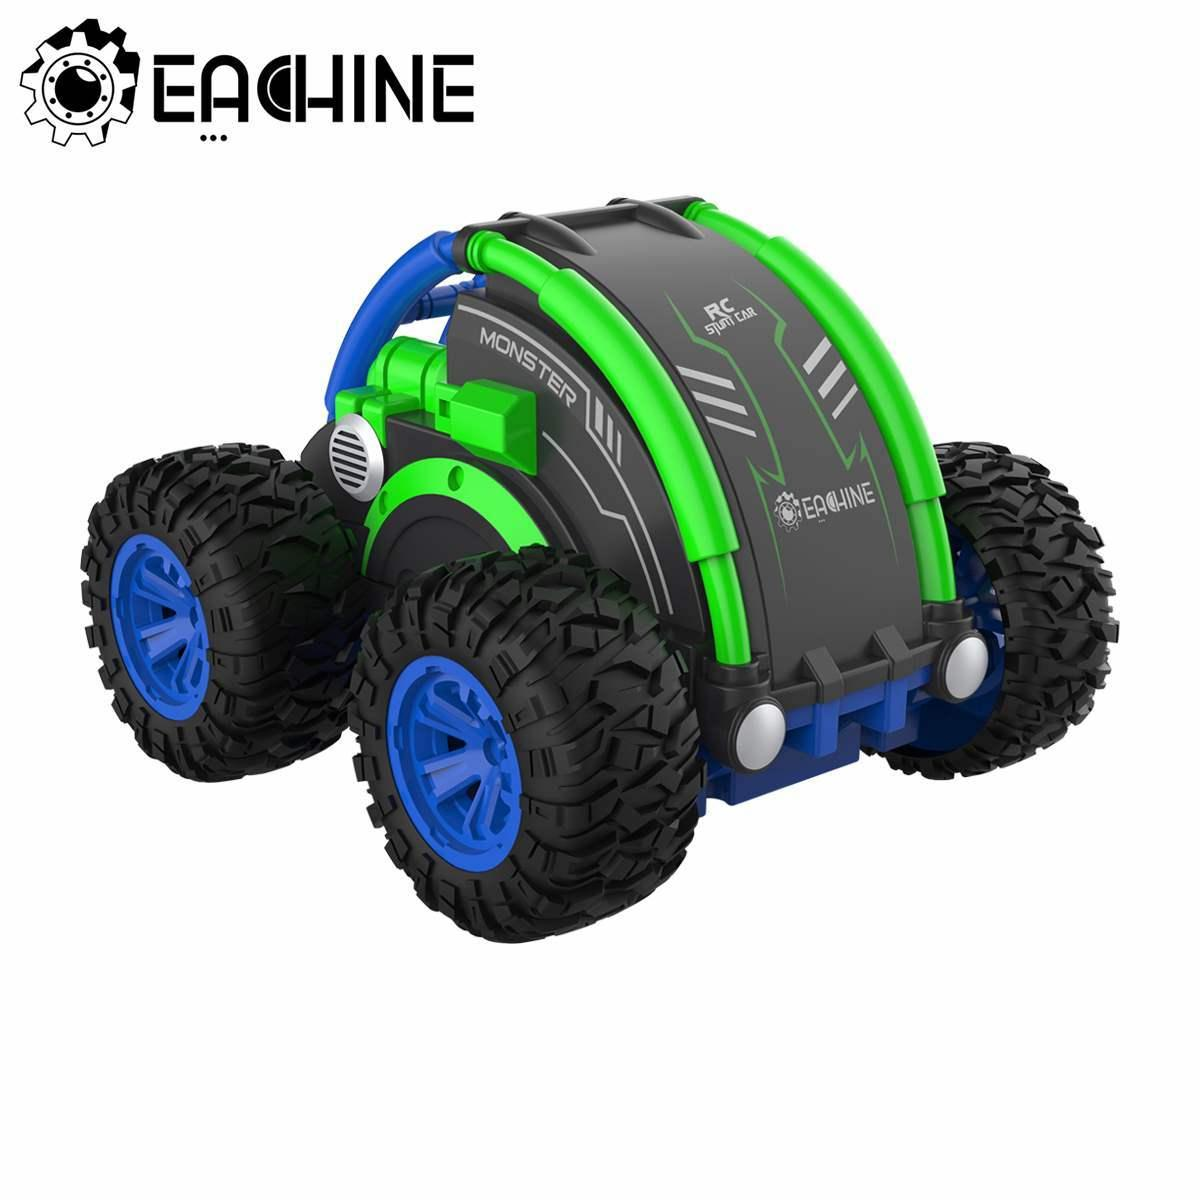 Eachine RC Car Hight Speed Drift Auto Buggy Stunt Drift Deformation Rock Crawler Roll Cars Flip For Kids Adults Toy LJ200918